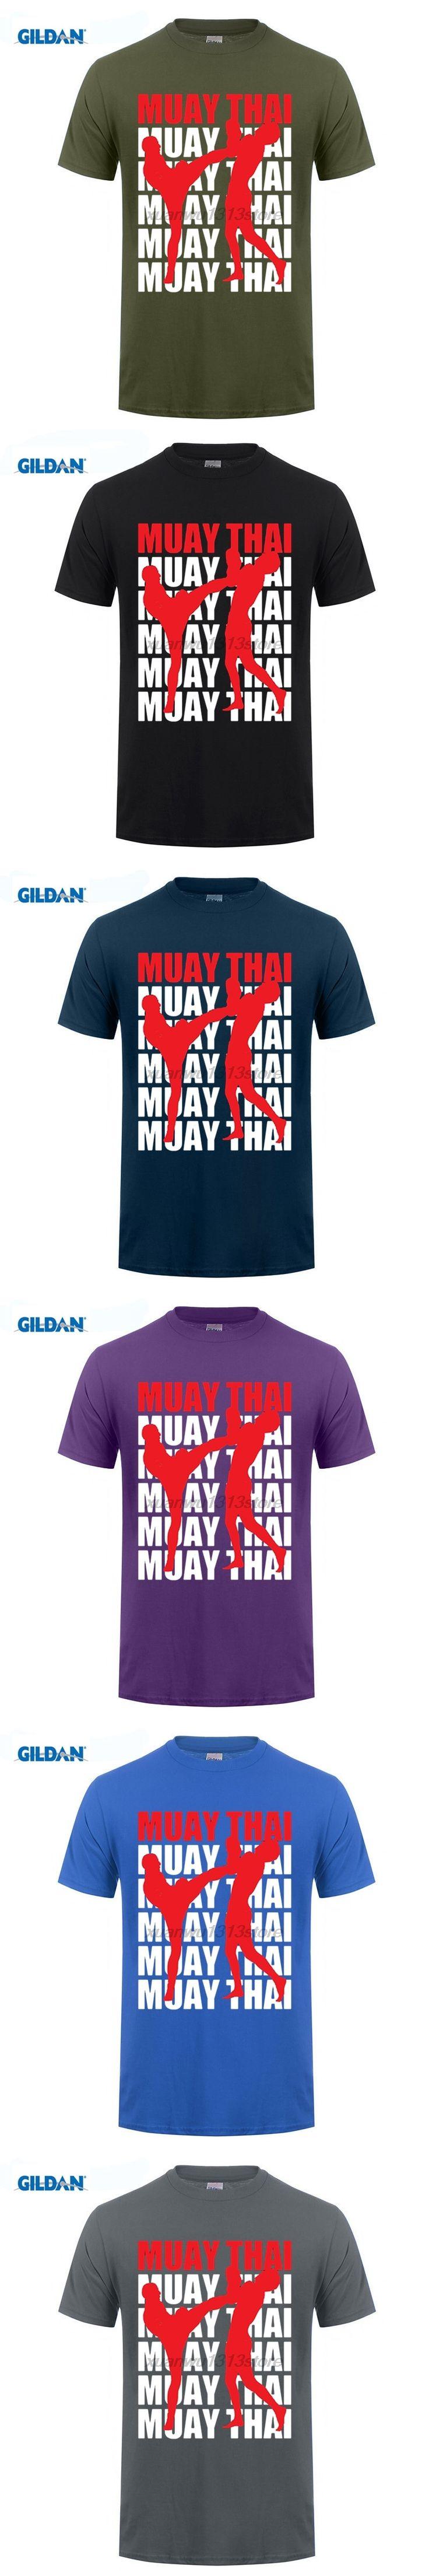 GILDAN Retro T Shirts Muay Thai Boxinger Letter Art Men Crew Neck Short Sleeve Tees Shirt Printed Youth Crazy T-Shirts